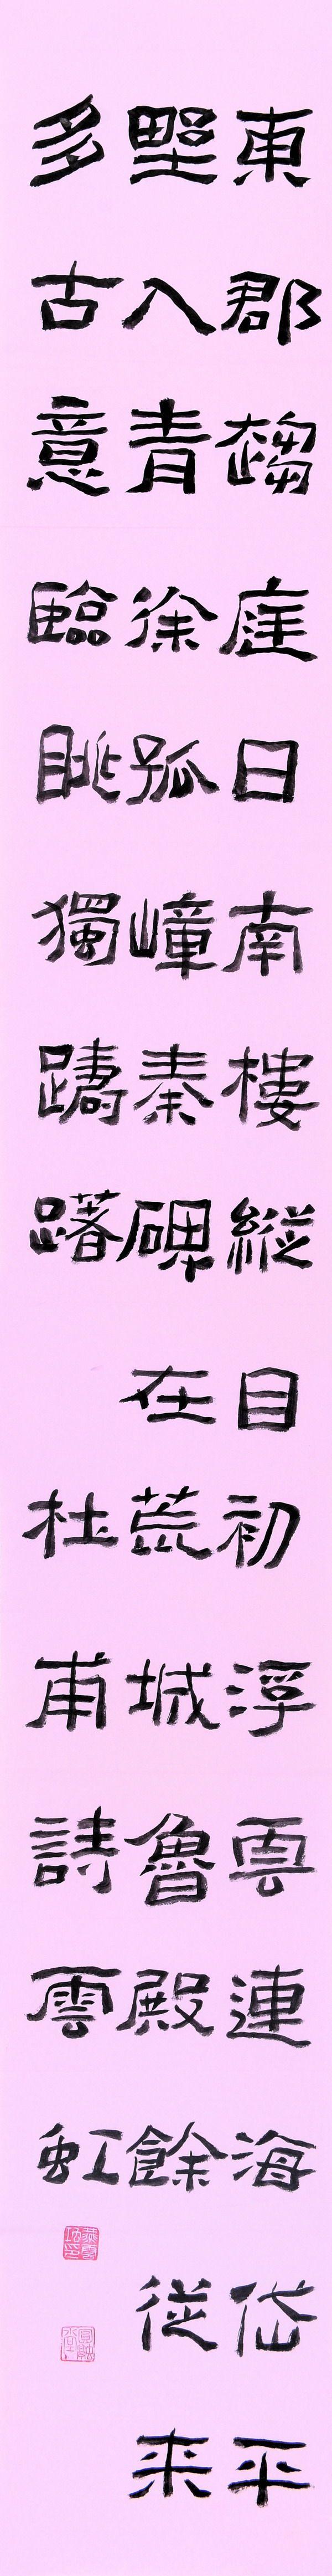 燕云虹书法